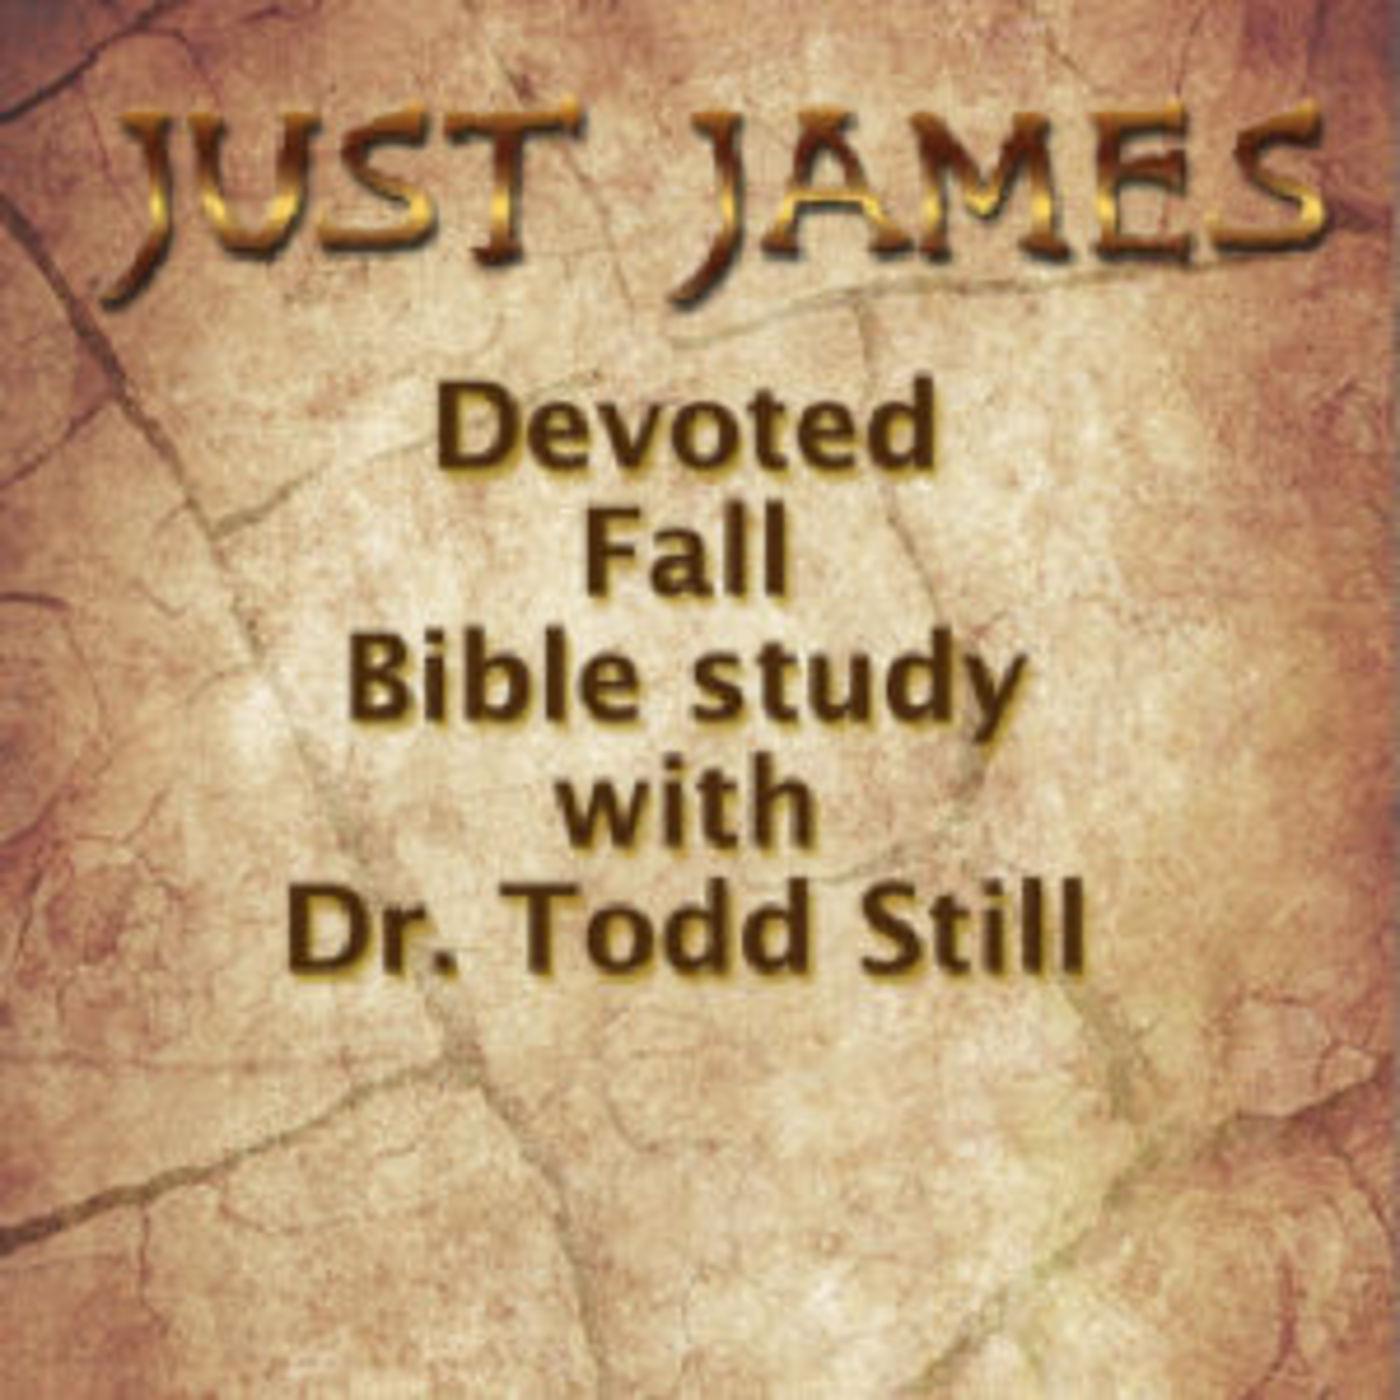 <![CDATA[Just James]]>